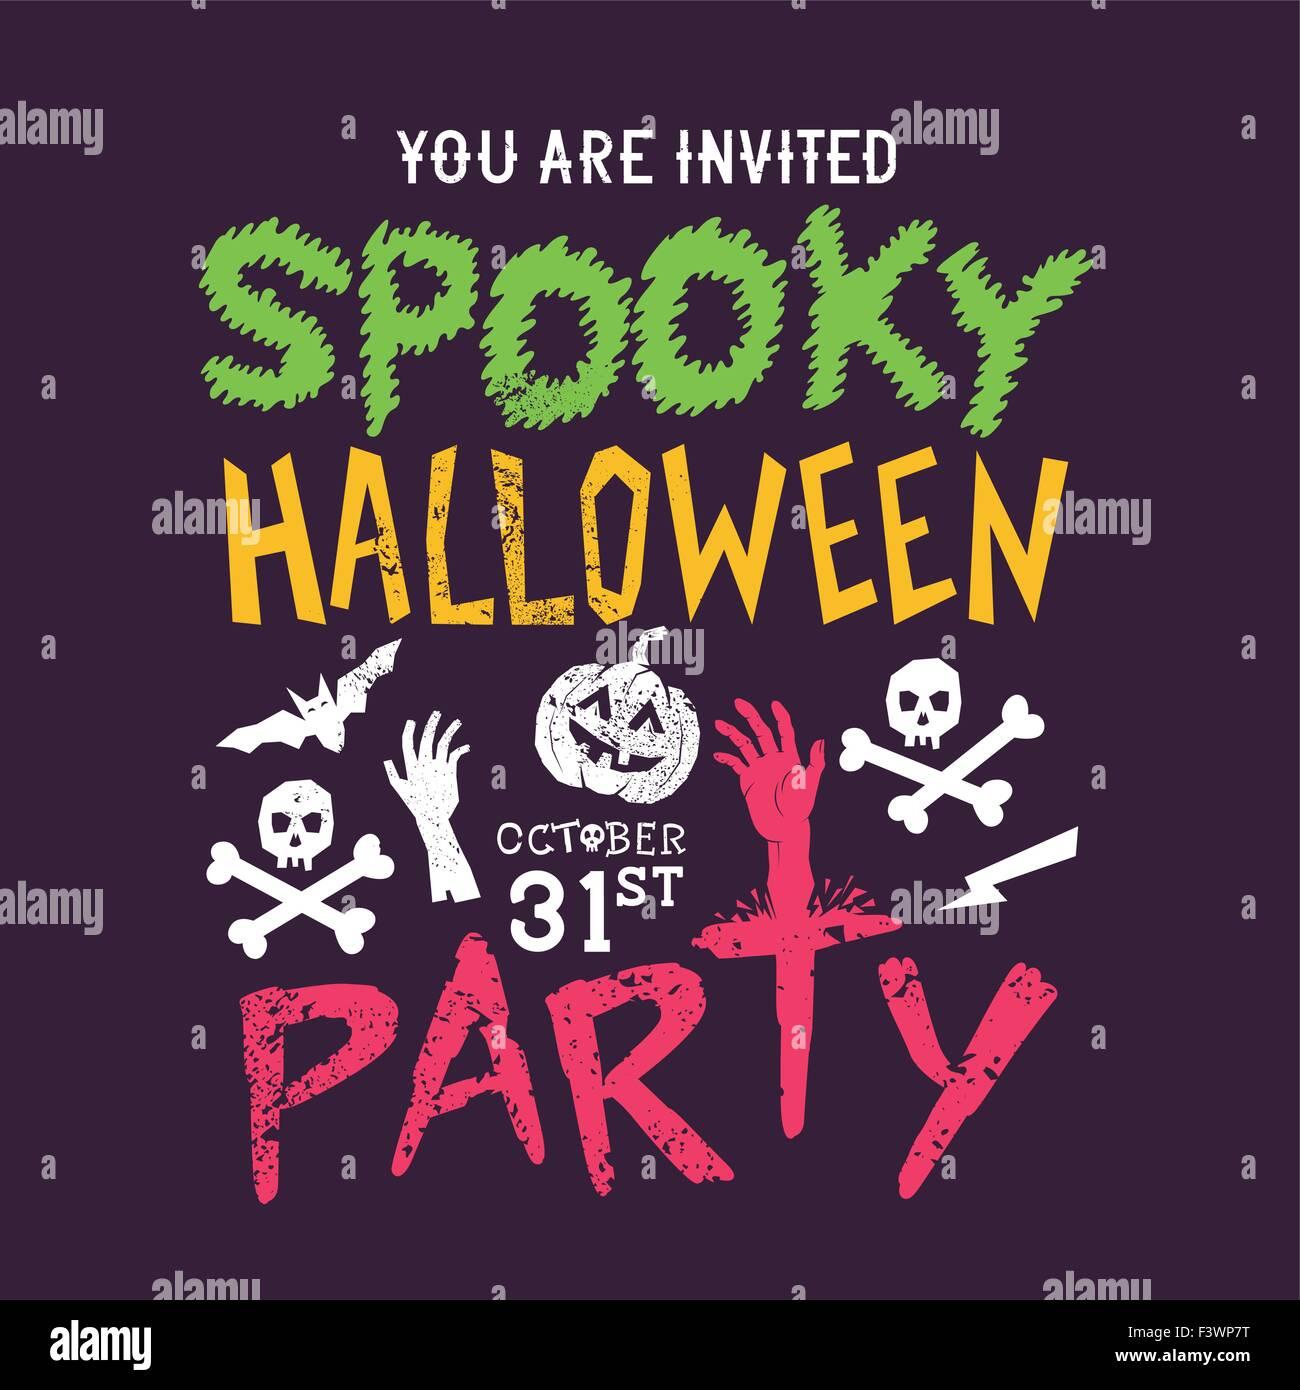 Spooky Halloween Party póster de diseño. Feliz Halloween! Ilustración vectorial Imagen De Stock